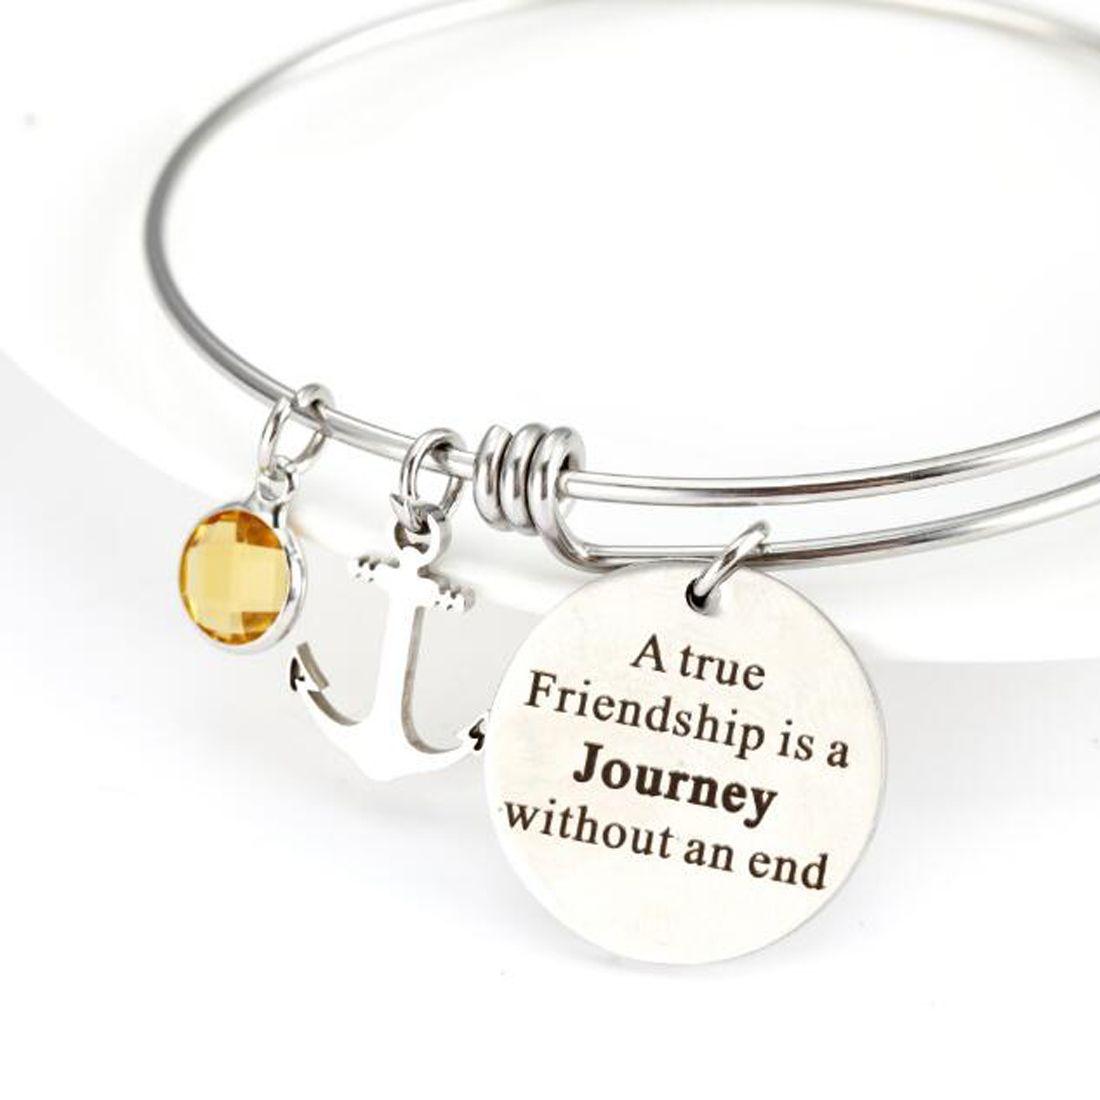 Silver Best Friend Bracelets - A true friendship is a journey without an end Bracelets Adjustable,Round Birthstone Bracelet Friendship Gifts